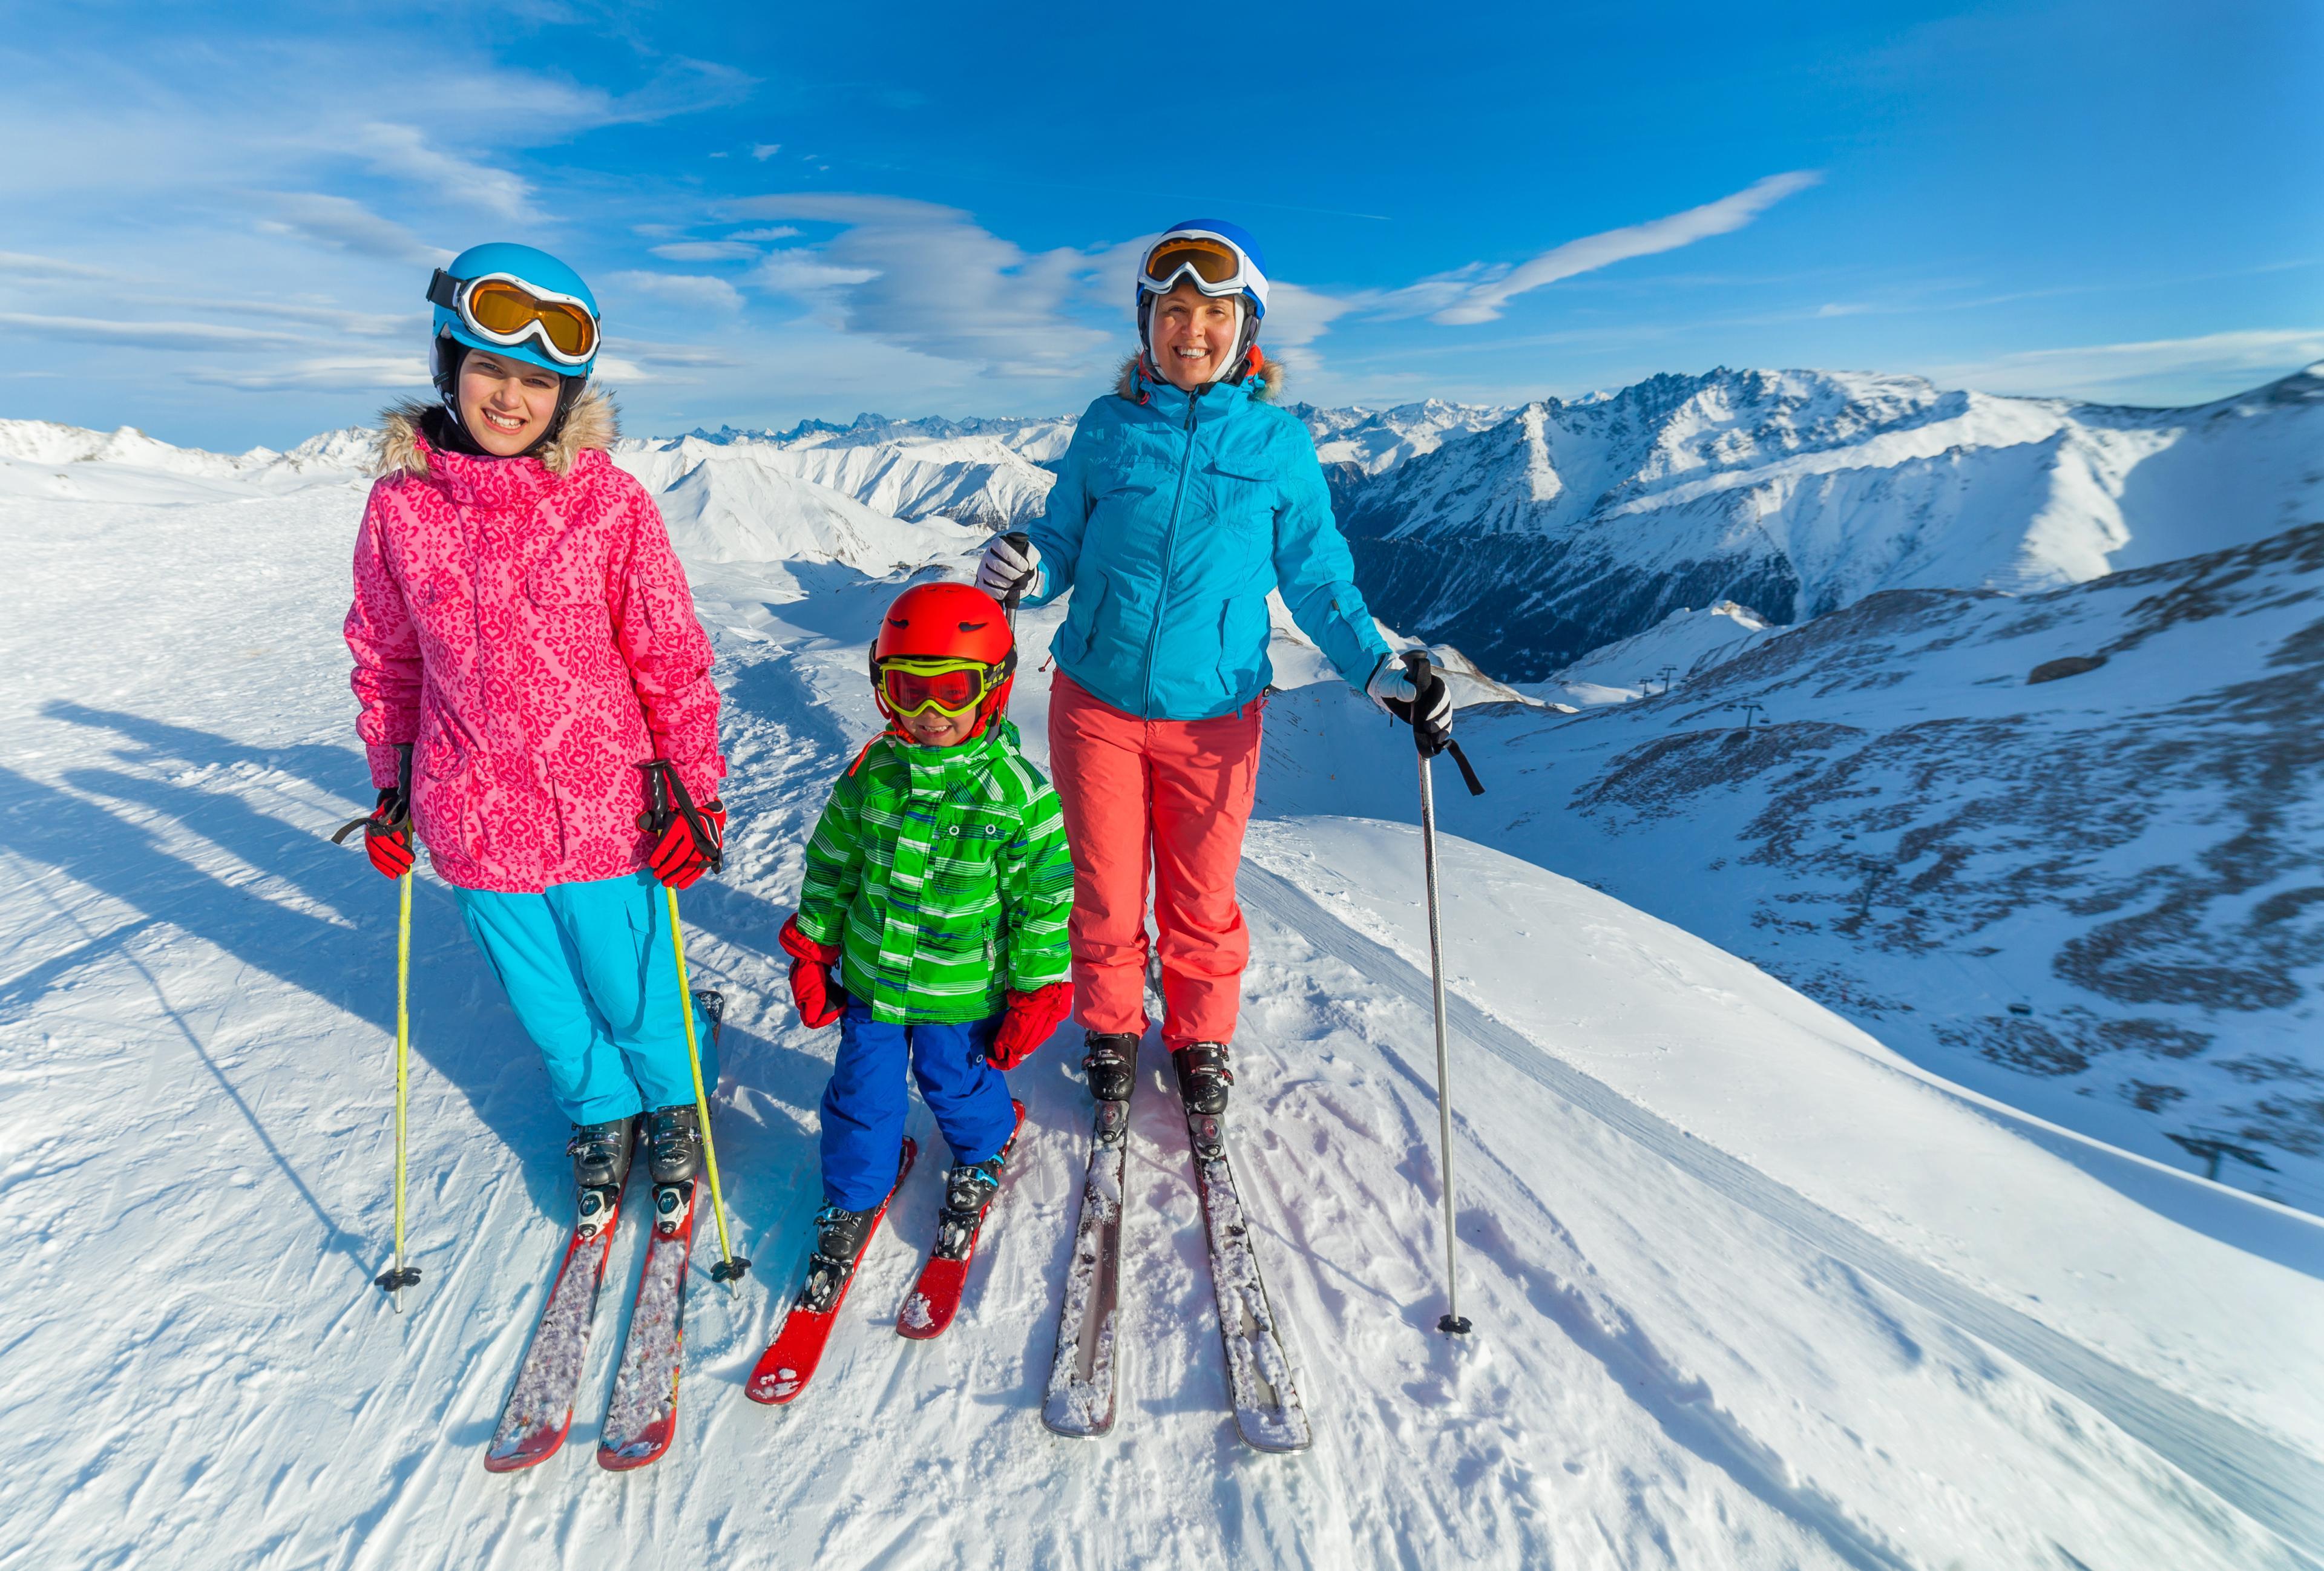 Ski Lessons for Families - Kaprun - All Levels